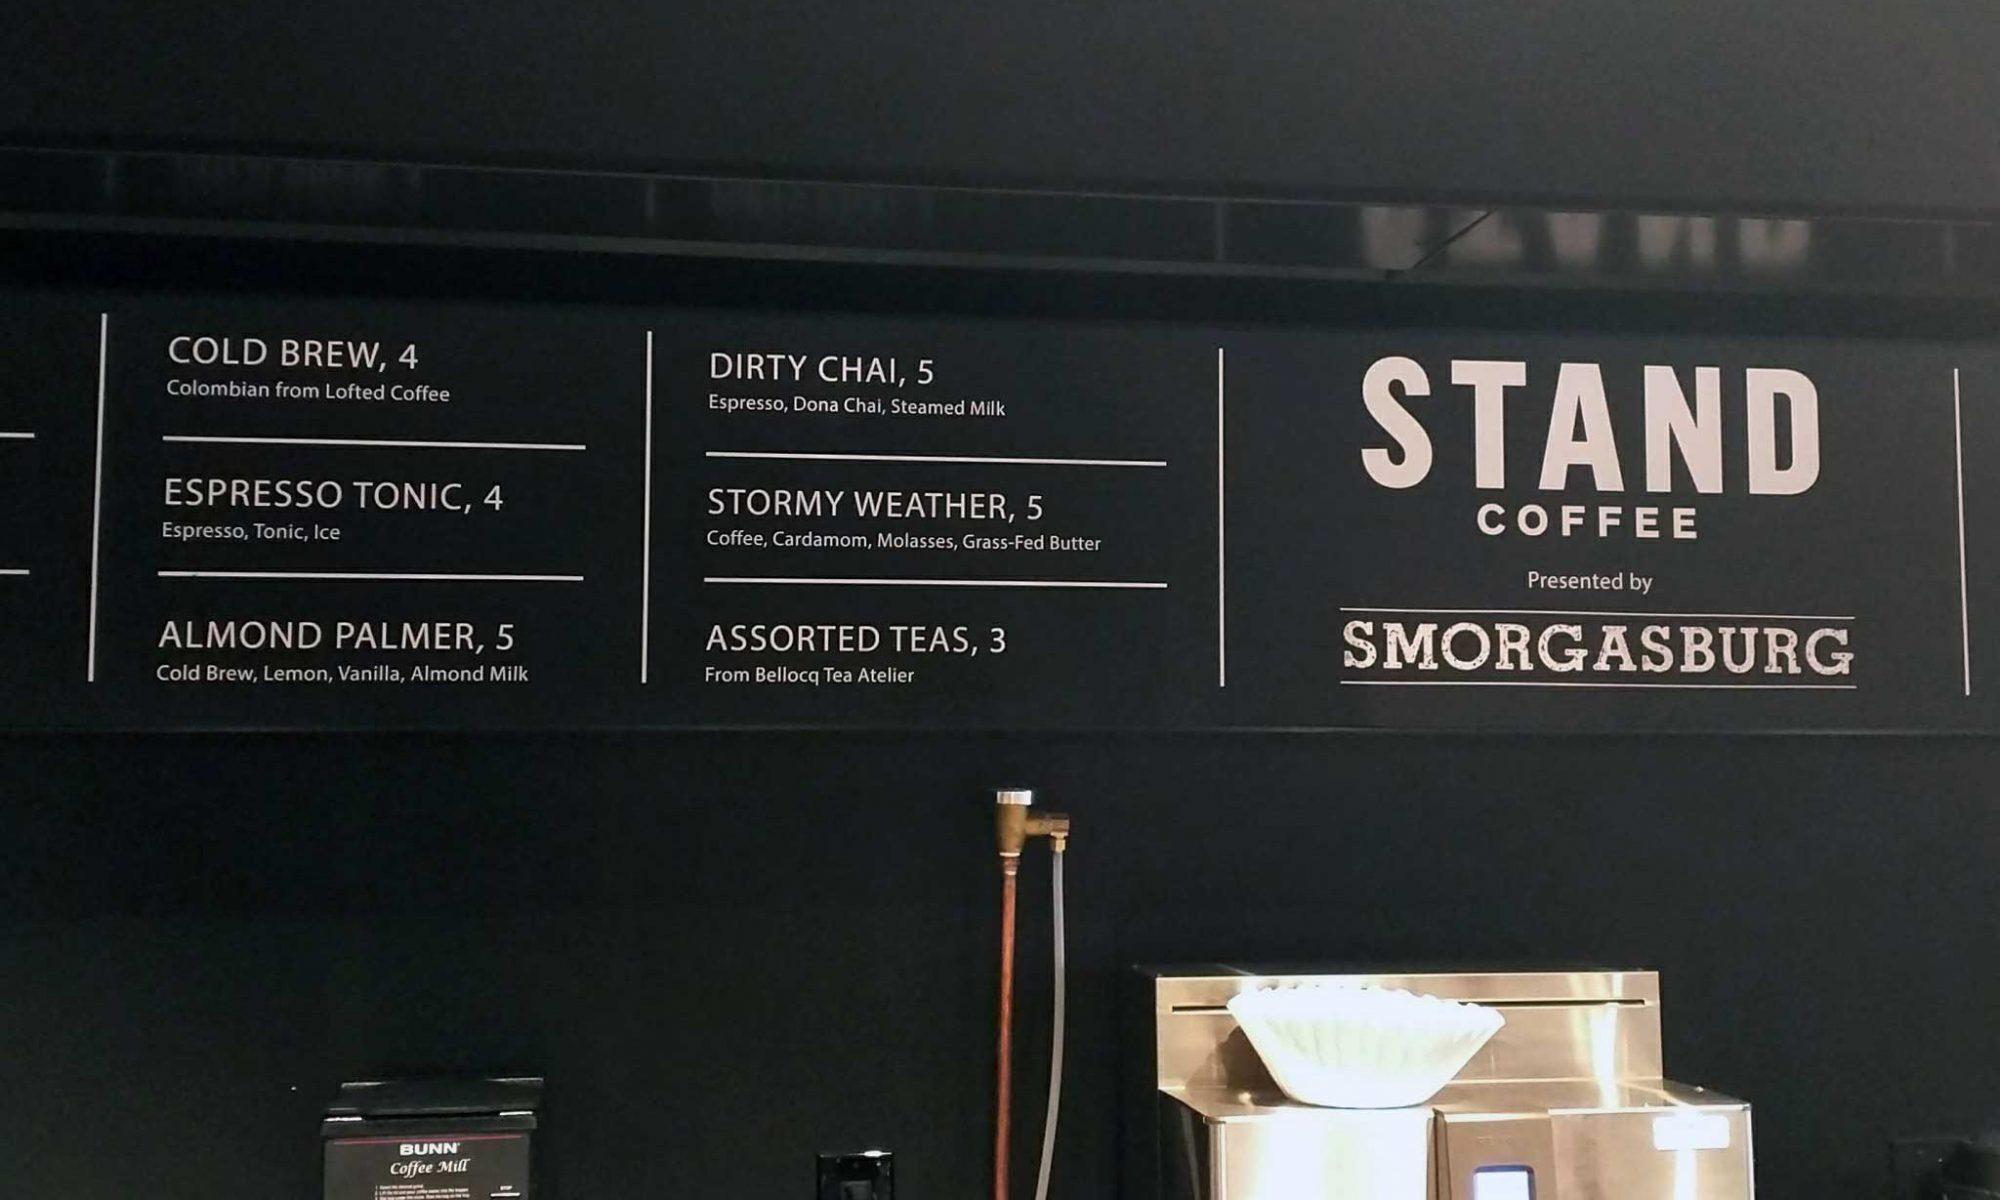 EC: Stand Coffee's Almond Palmer Is a Lemonade-Coffee Hybrid